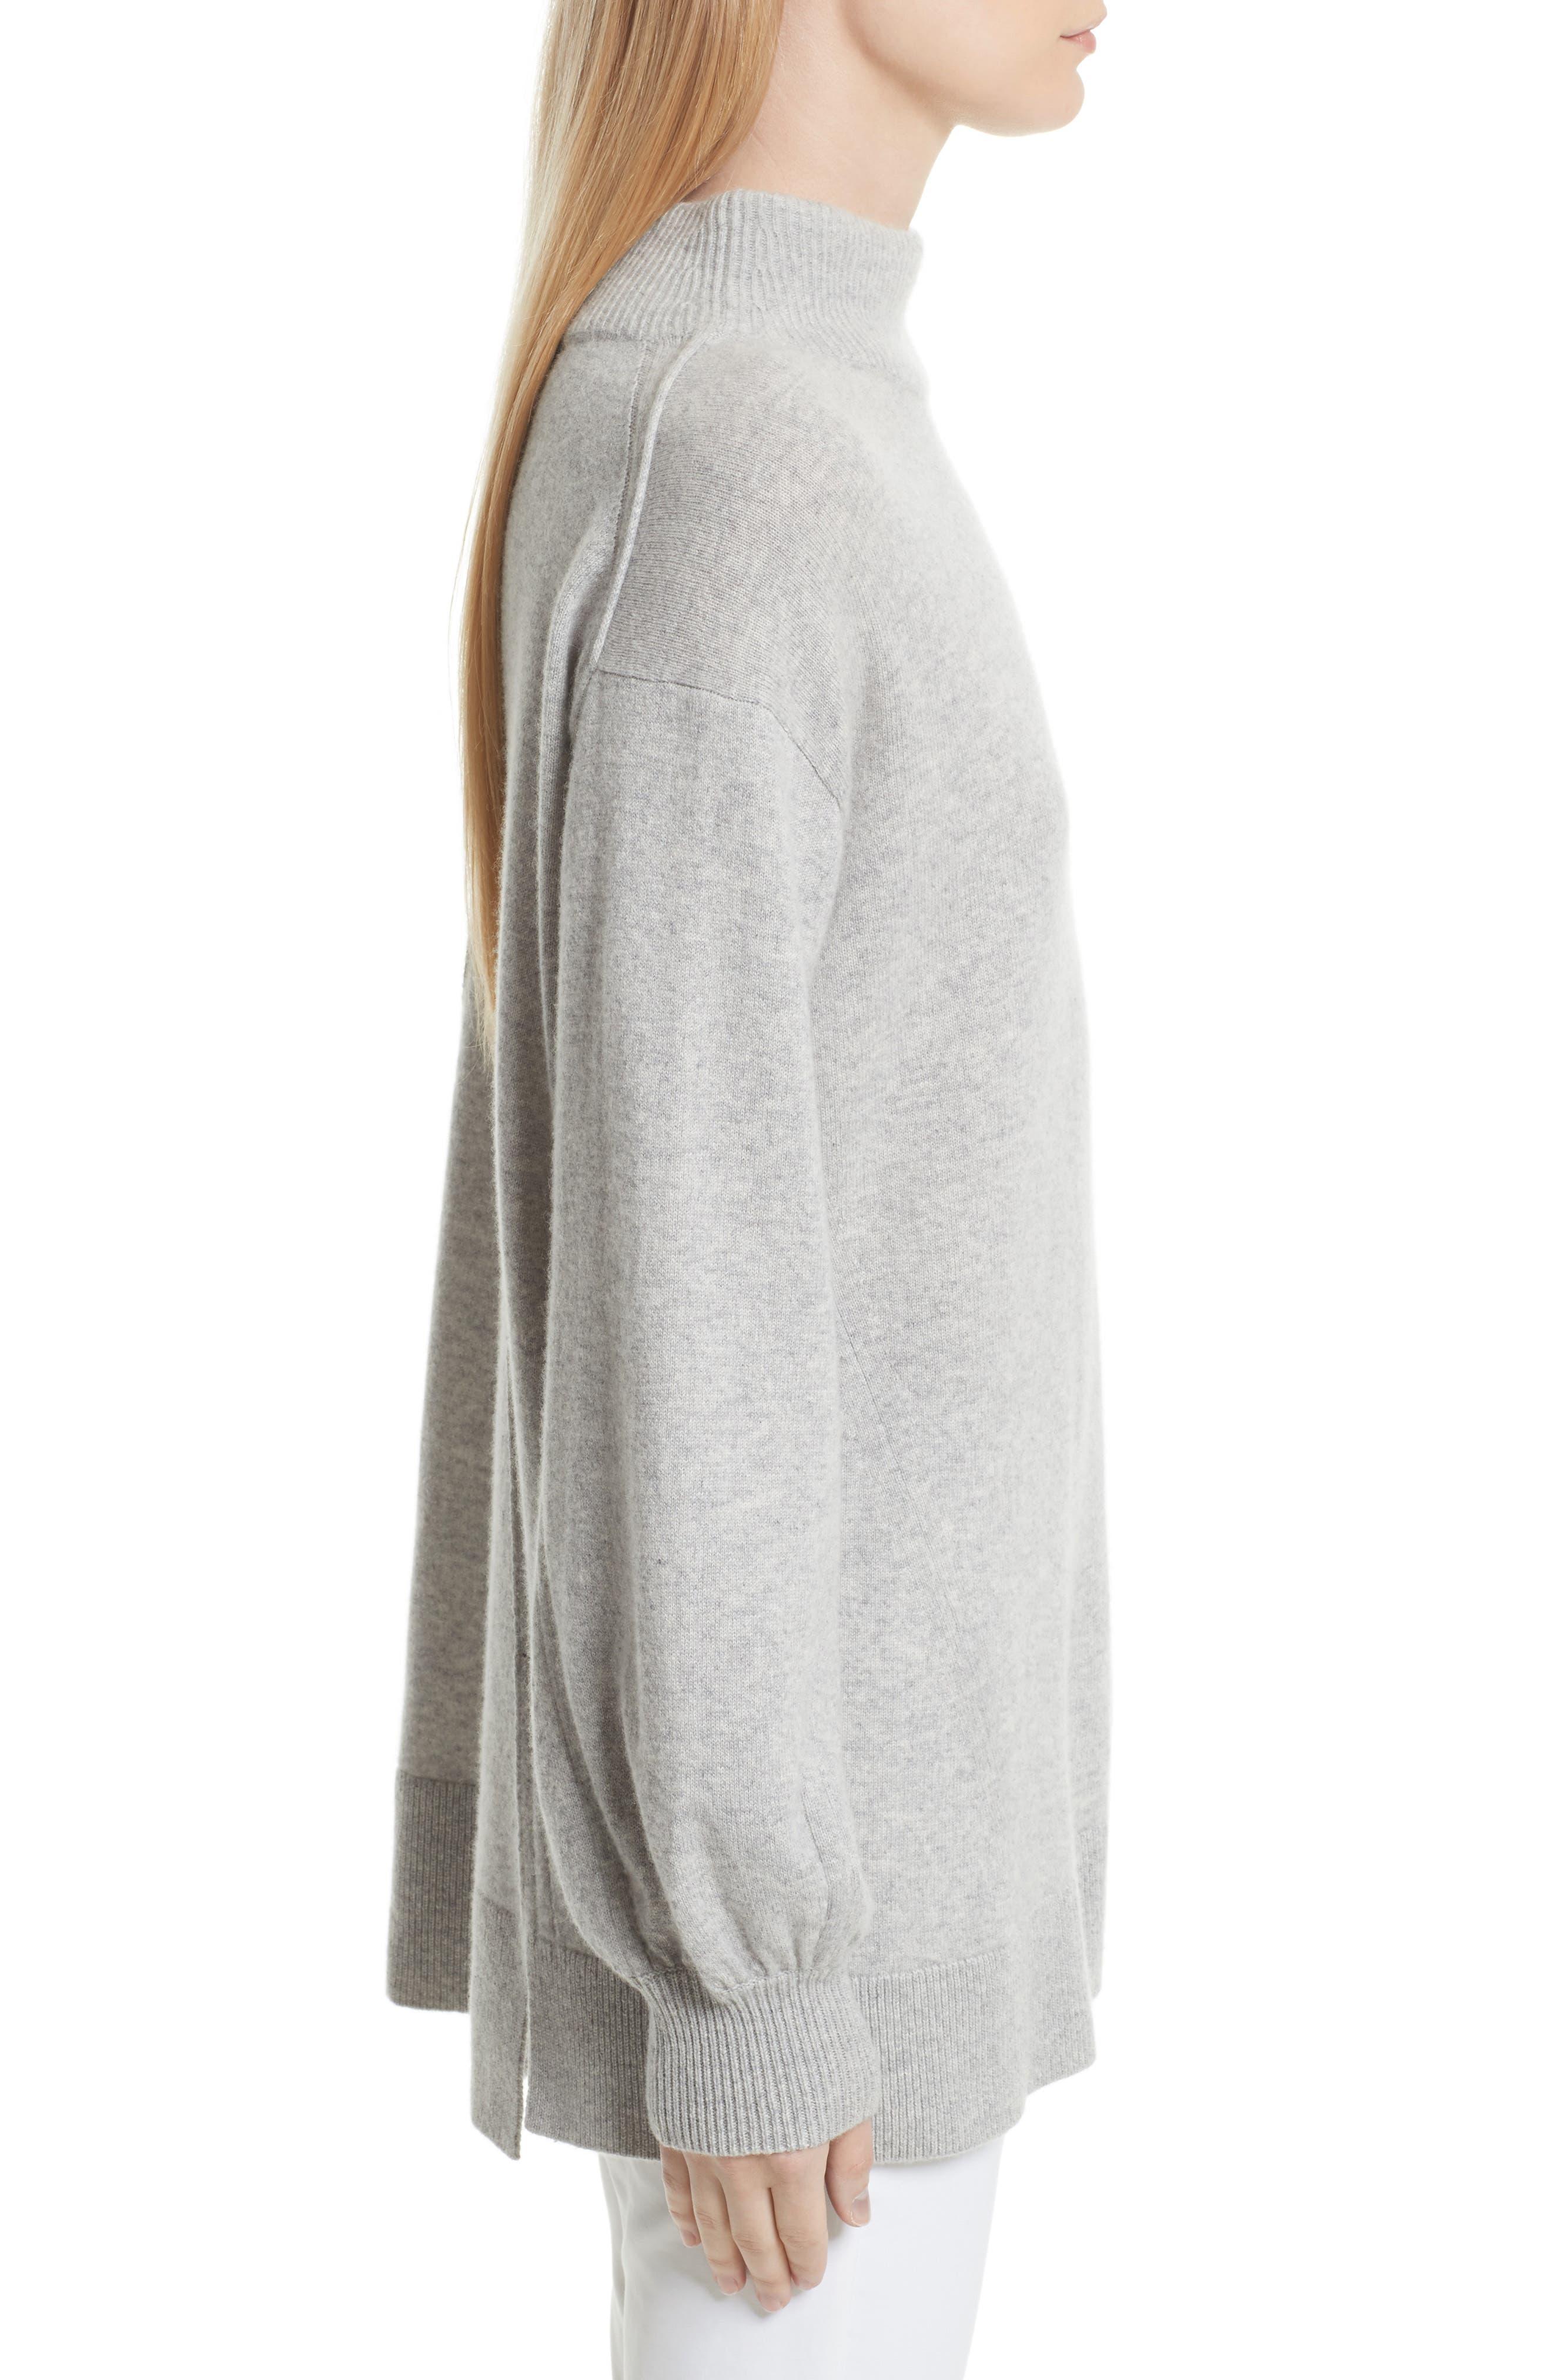 Ace Cashmere Turtleneck Sweater,                             Alternate thumbnail 3, color,                             058